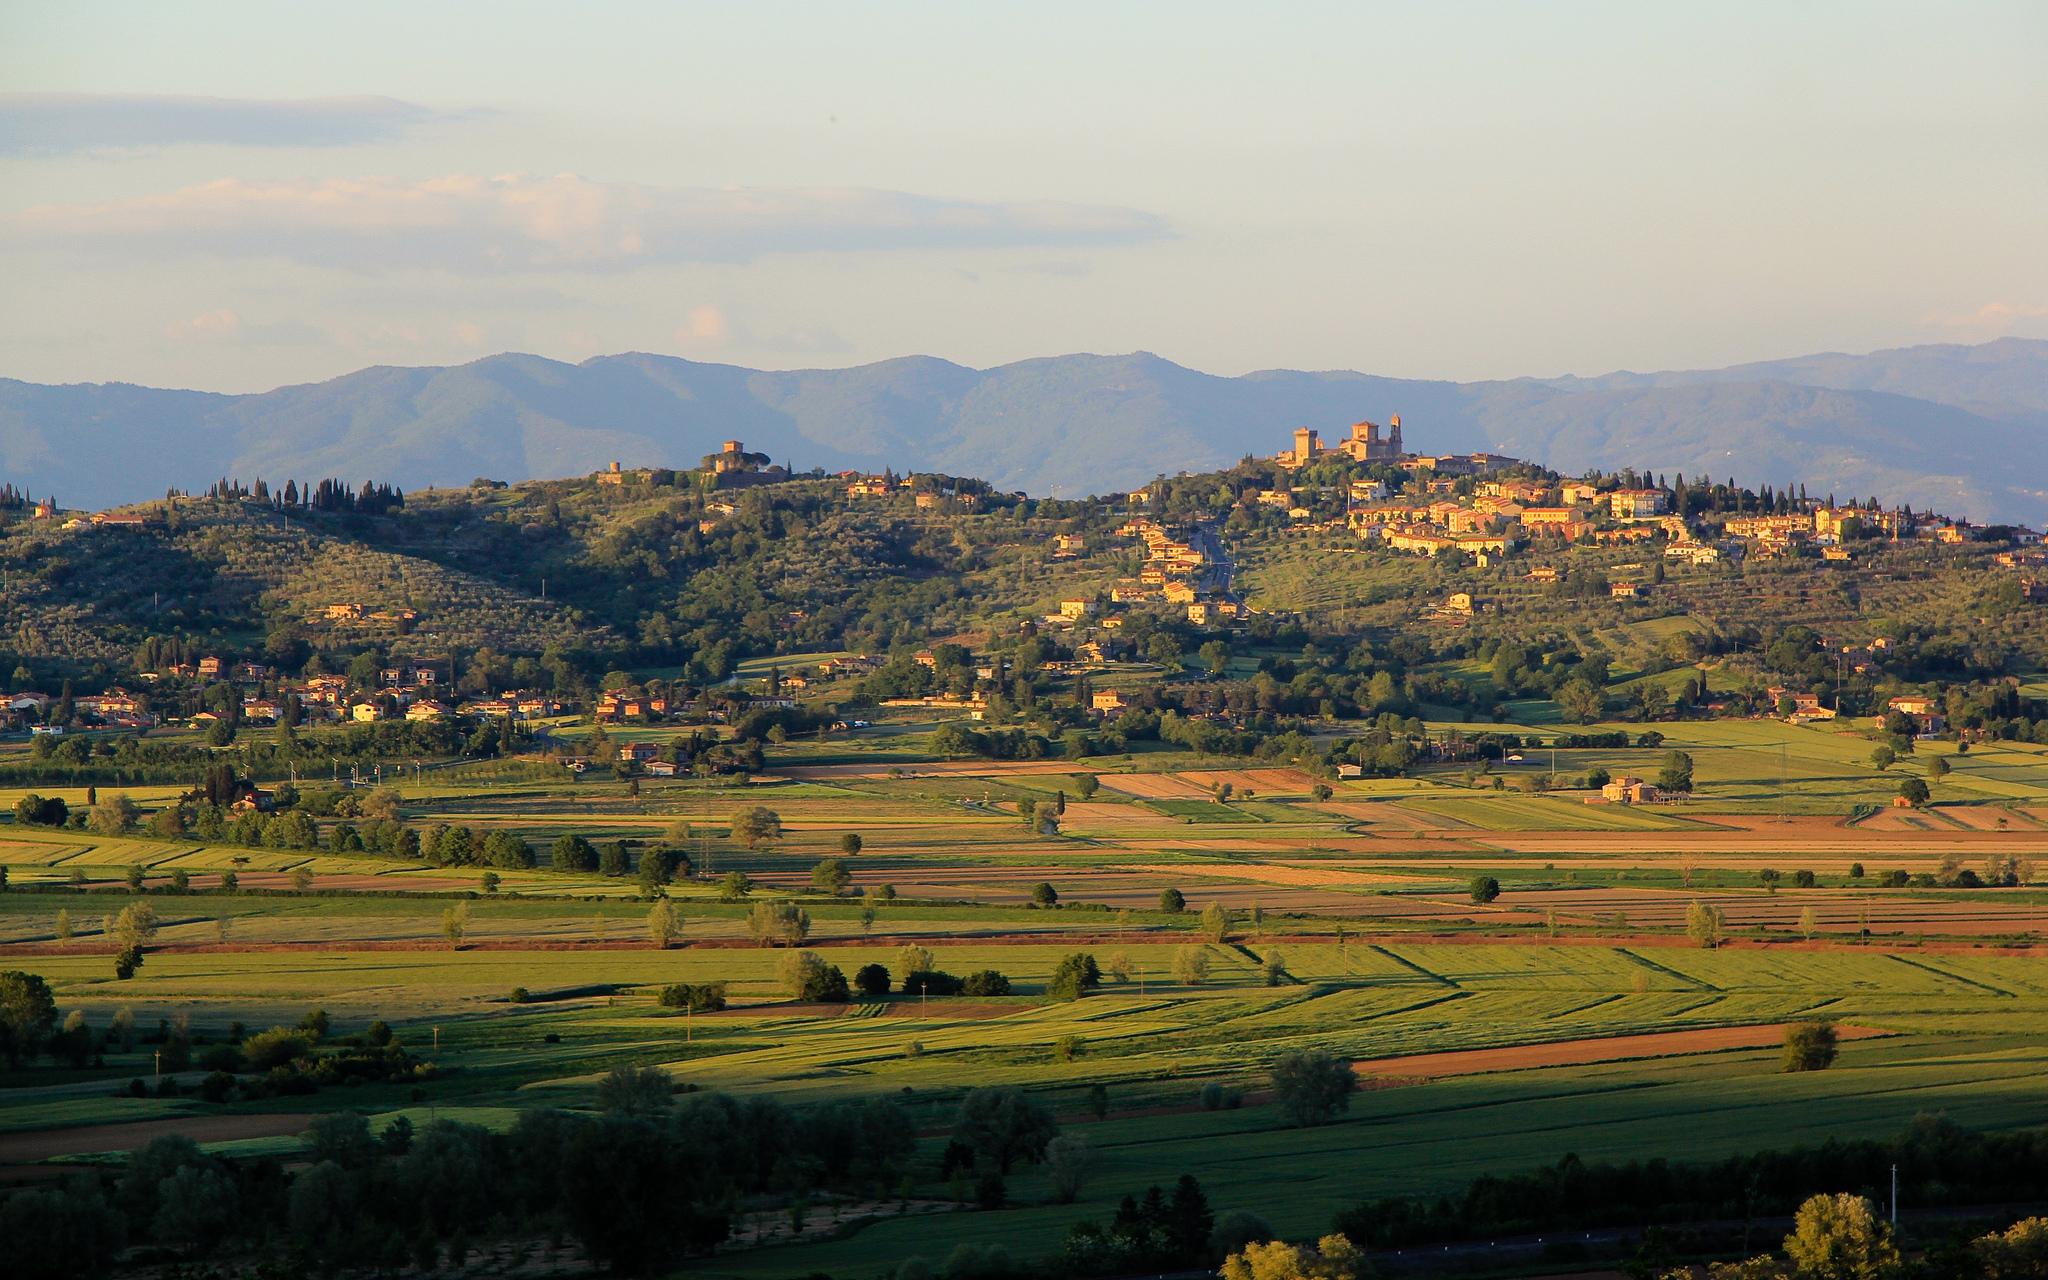 Lucignano skyline [Photo Credits: o.lee]